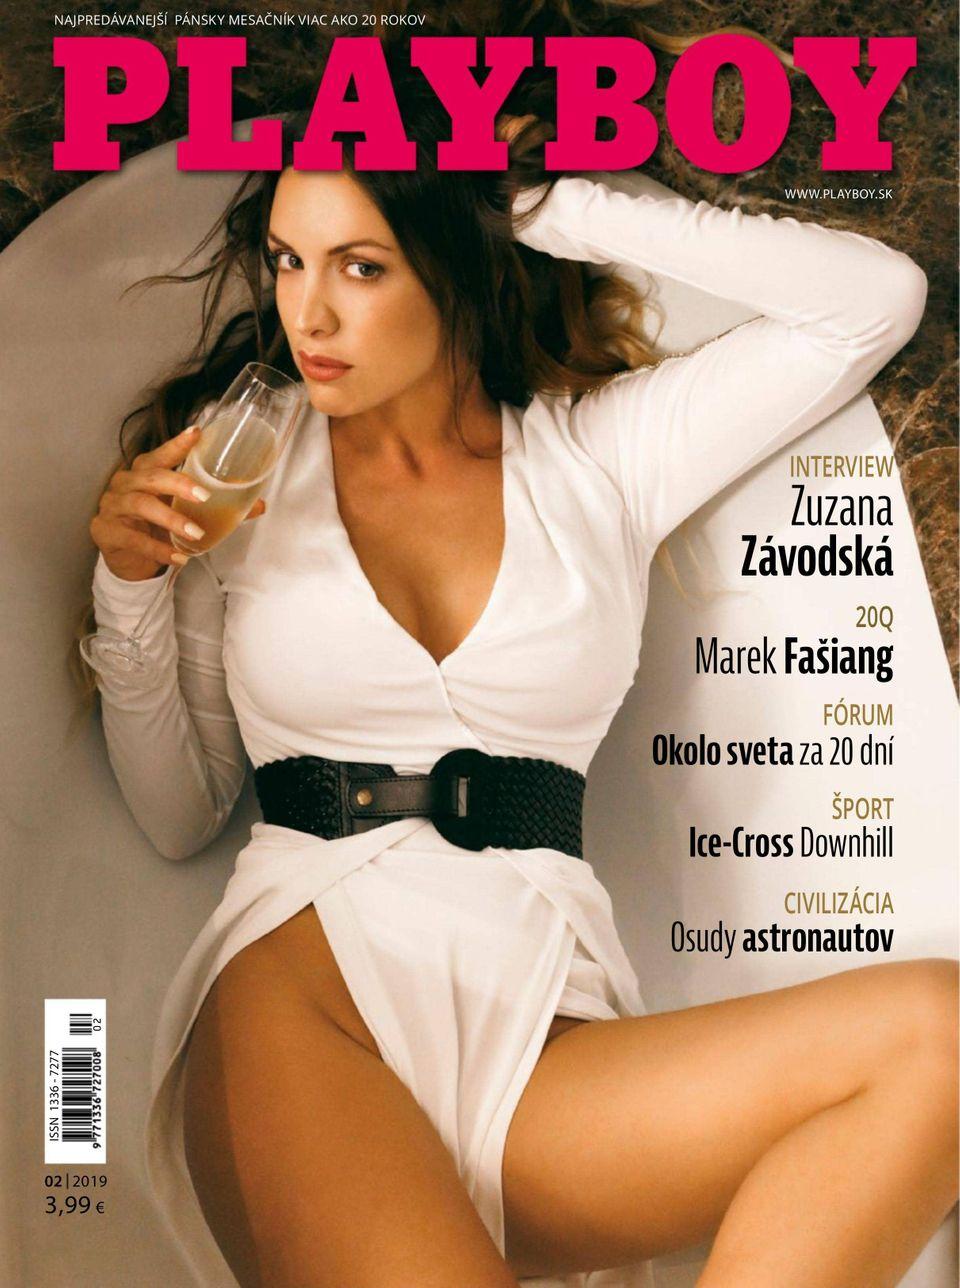 Playboy Slovakia-February 2019 Magazine - Get your Digital